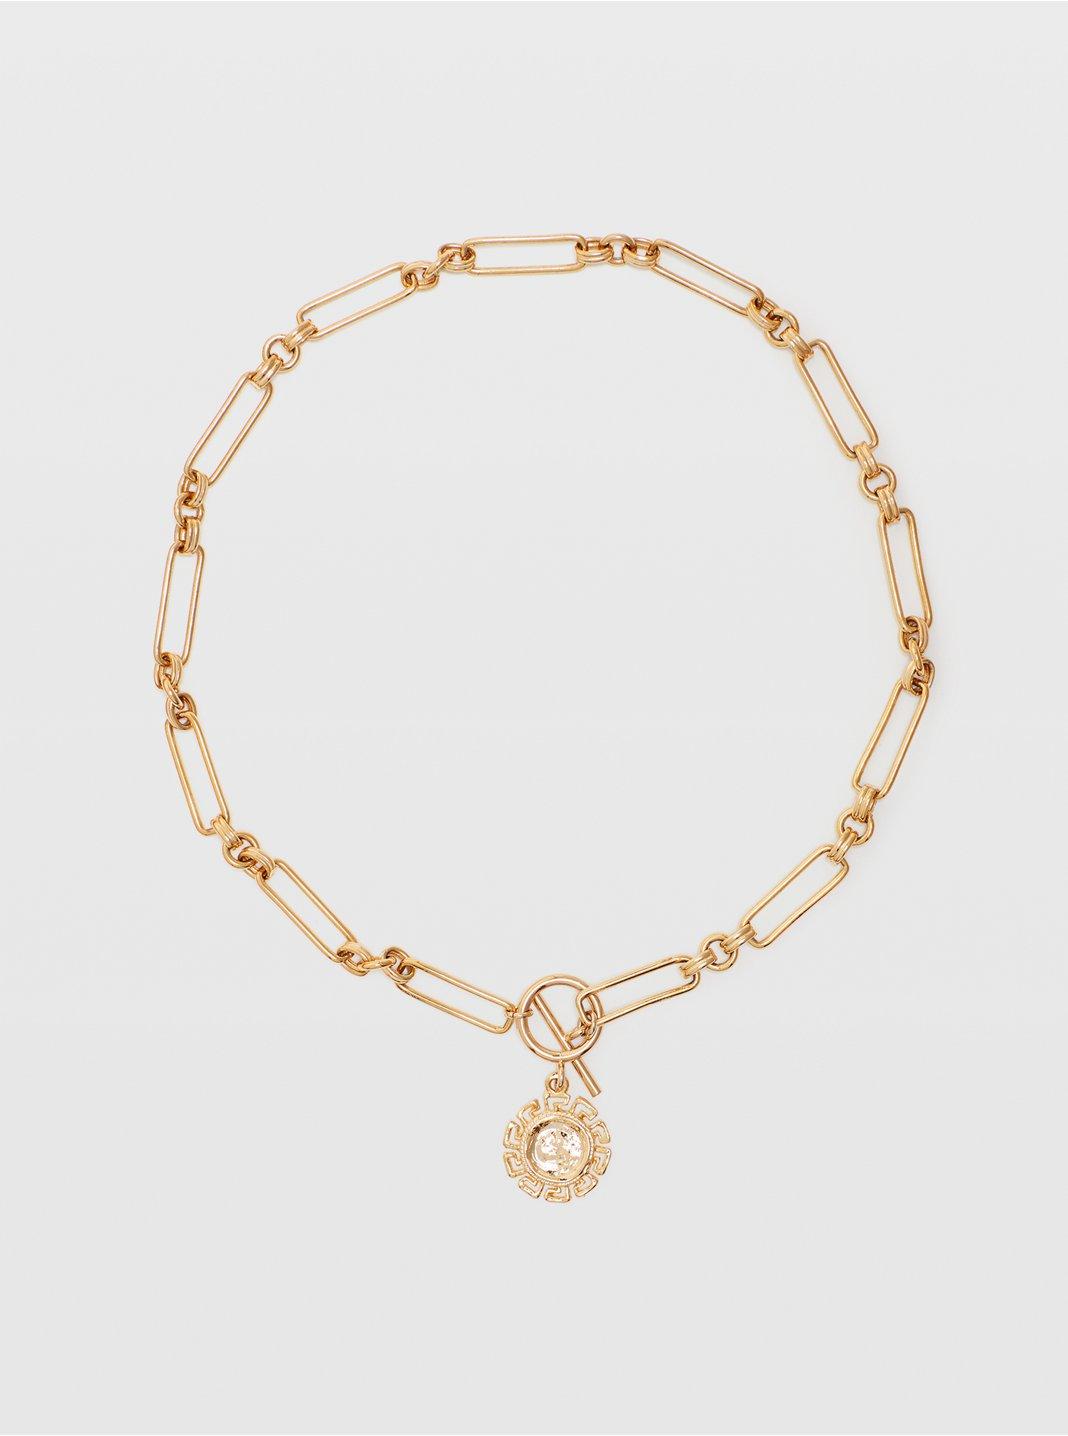 Serefina Short Link Necklace